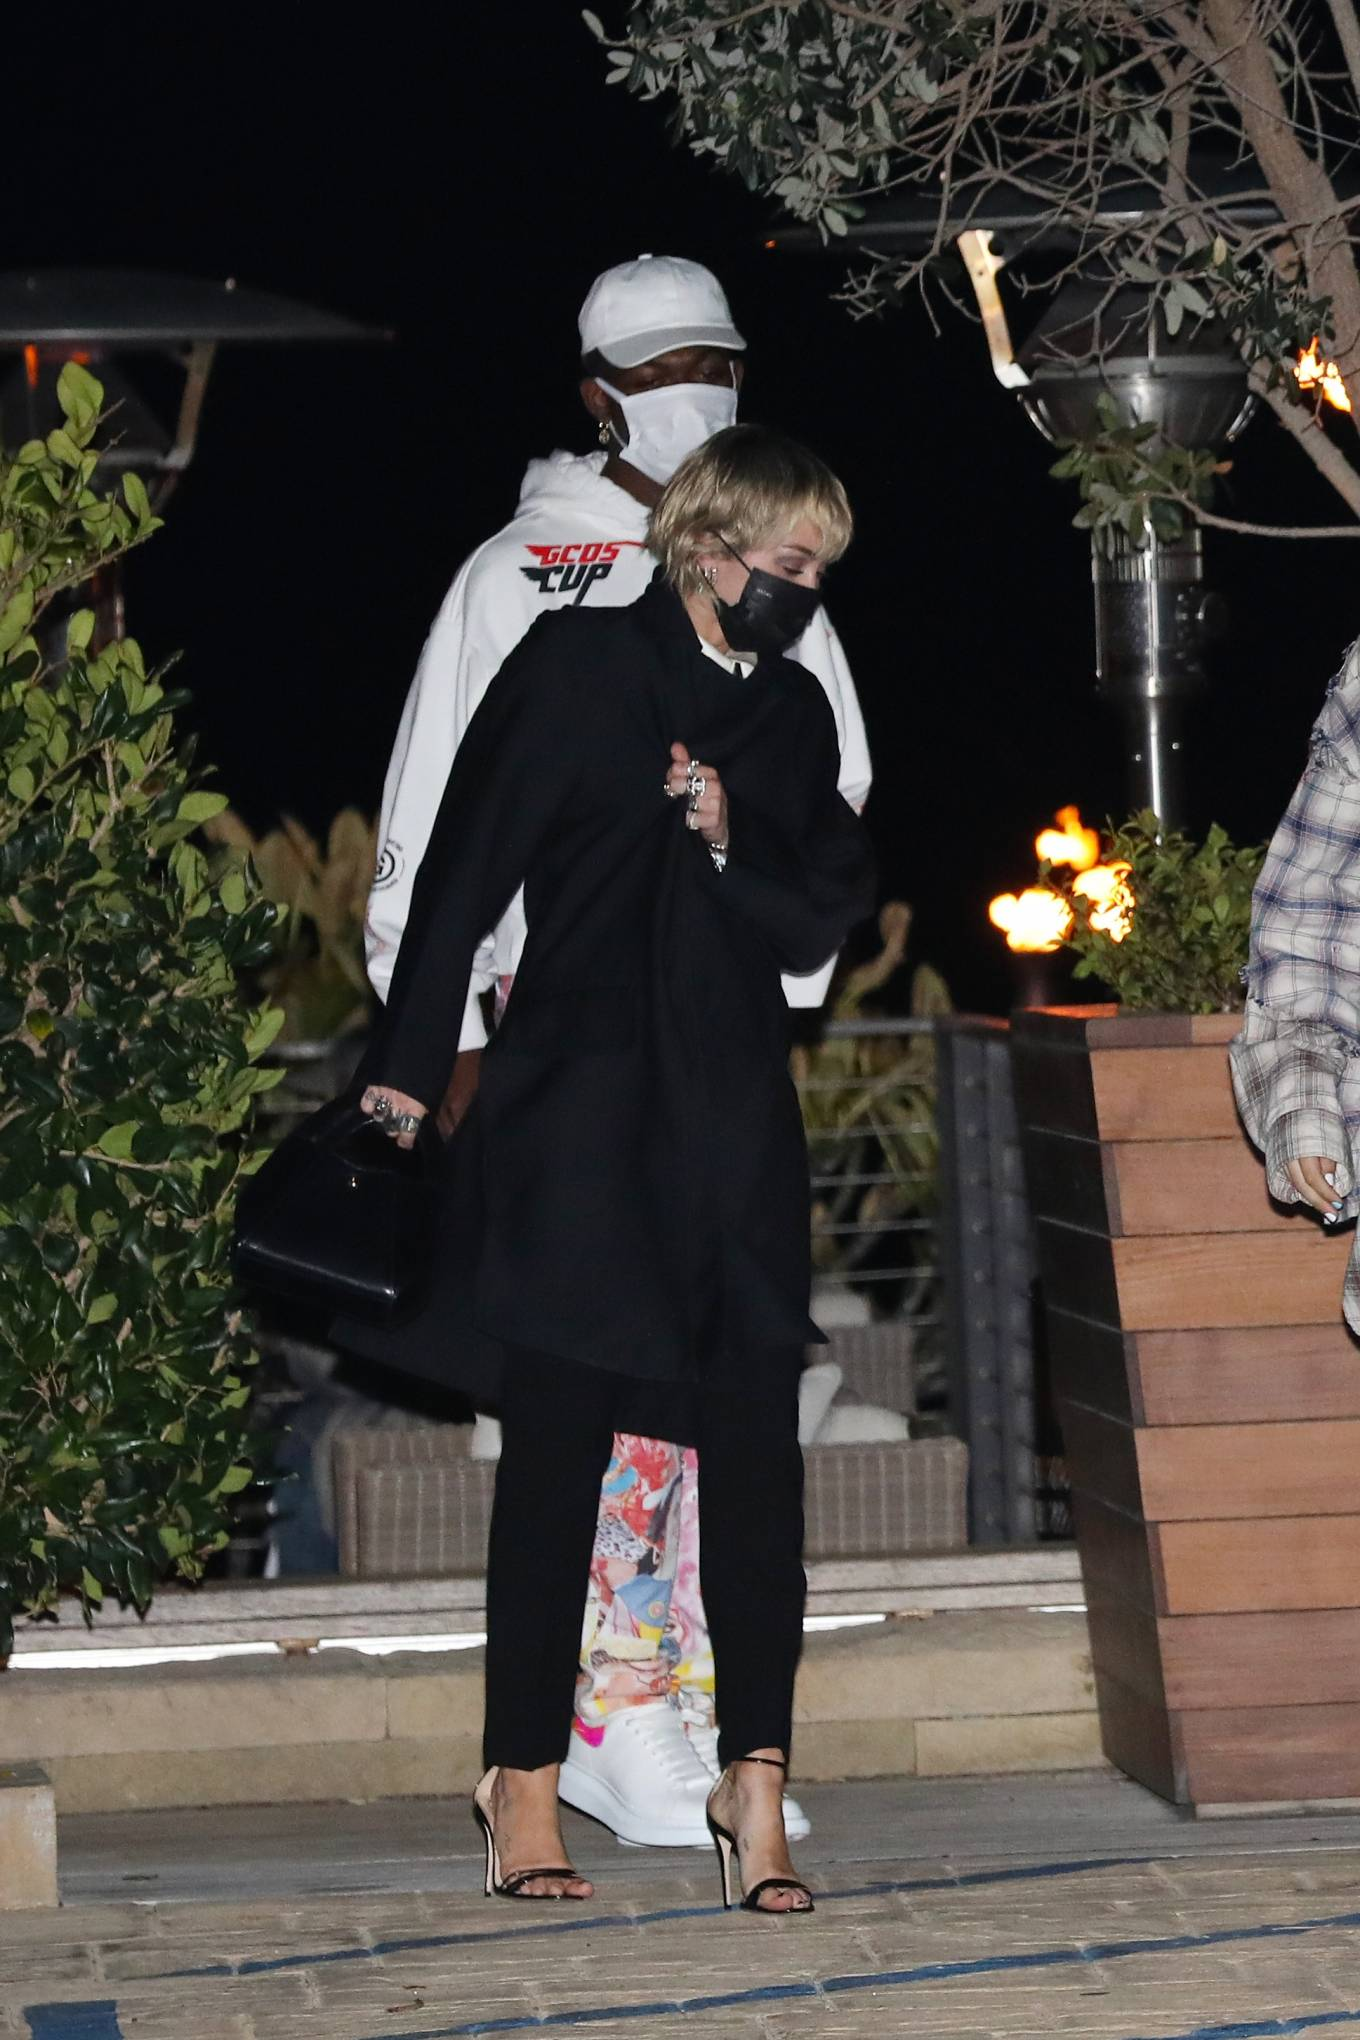 Miley Cyrus - With Lil Nas X grab dinner together at Nobu Malibu in Malibu